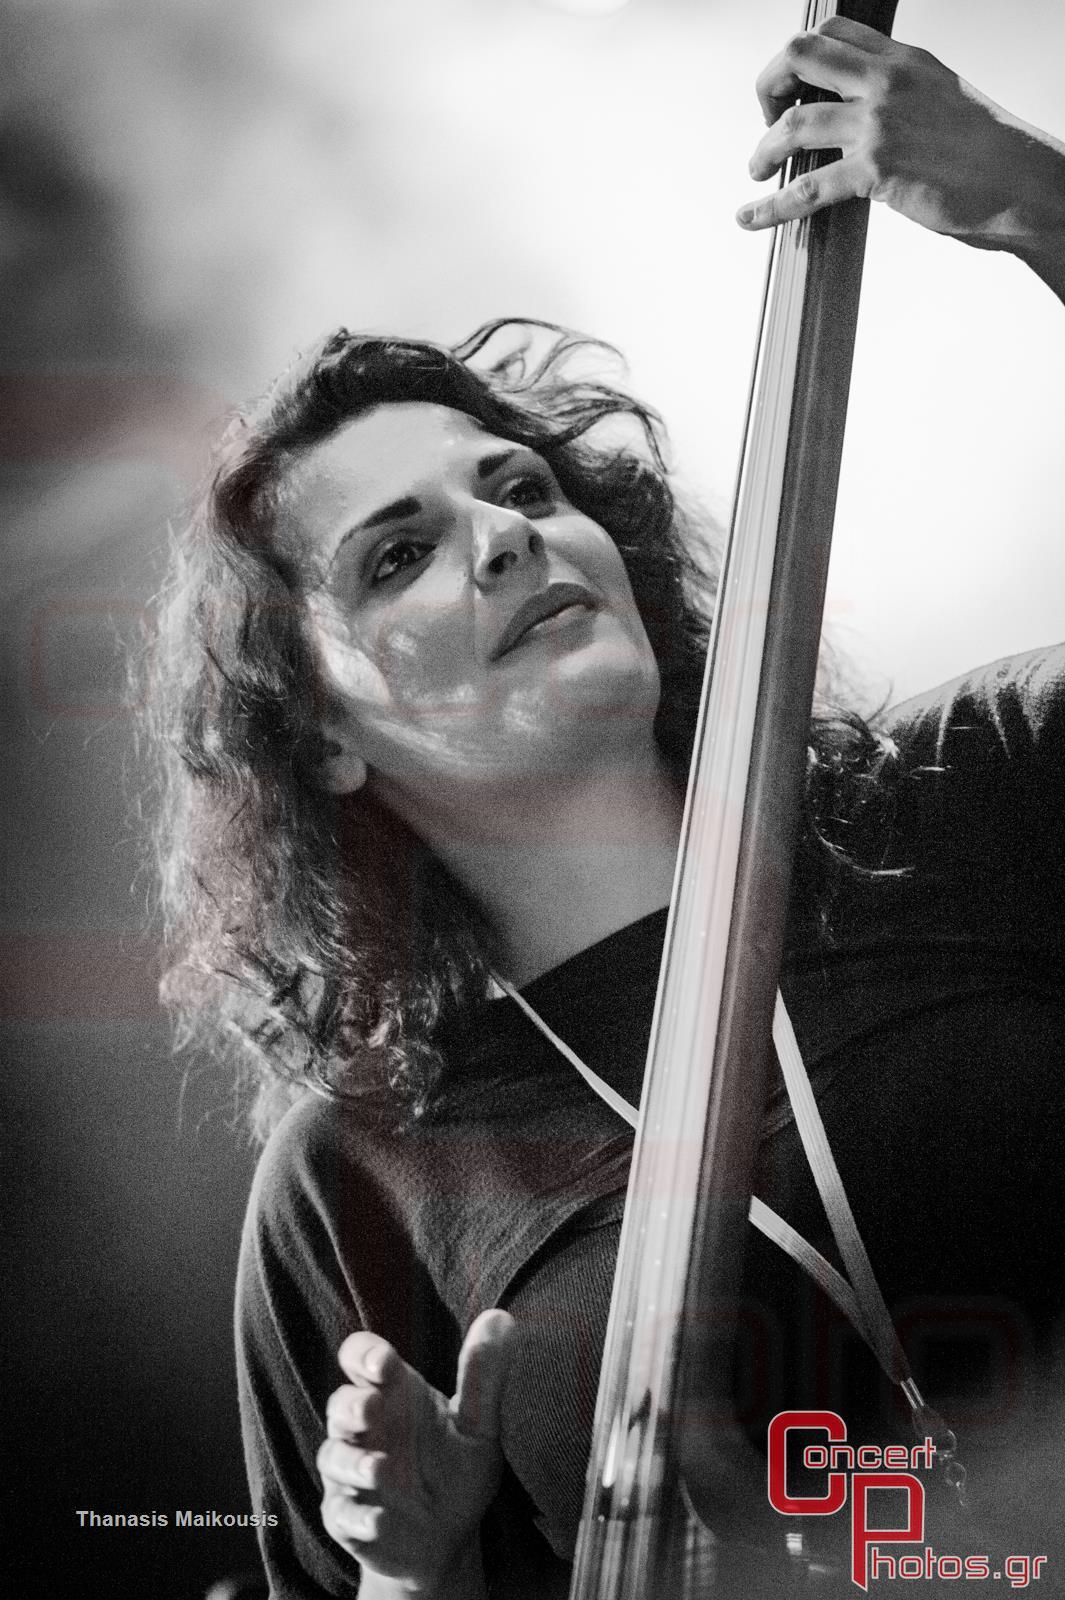 Active Member - Τραγούδα μας να φύγει το σκοτάδι- photographer: Thanasis Maikousis - concertphotos_-5709